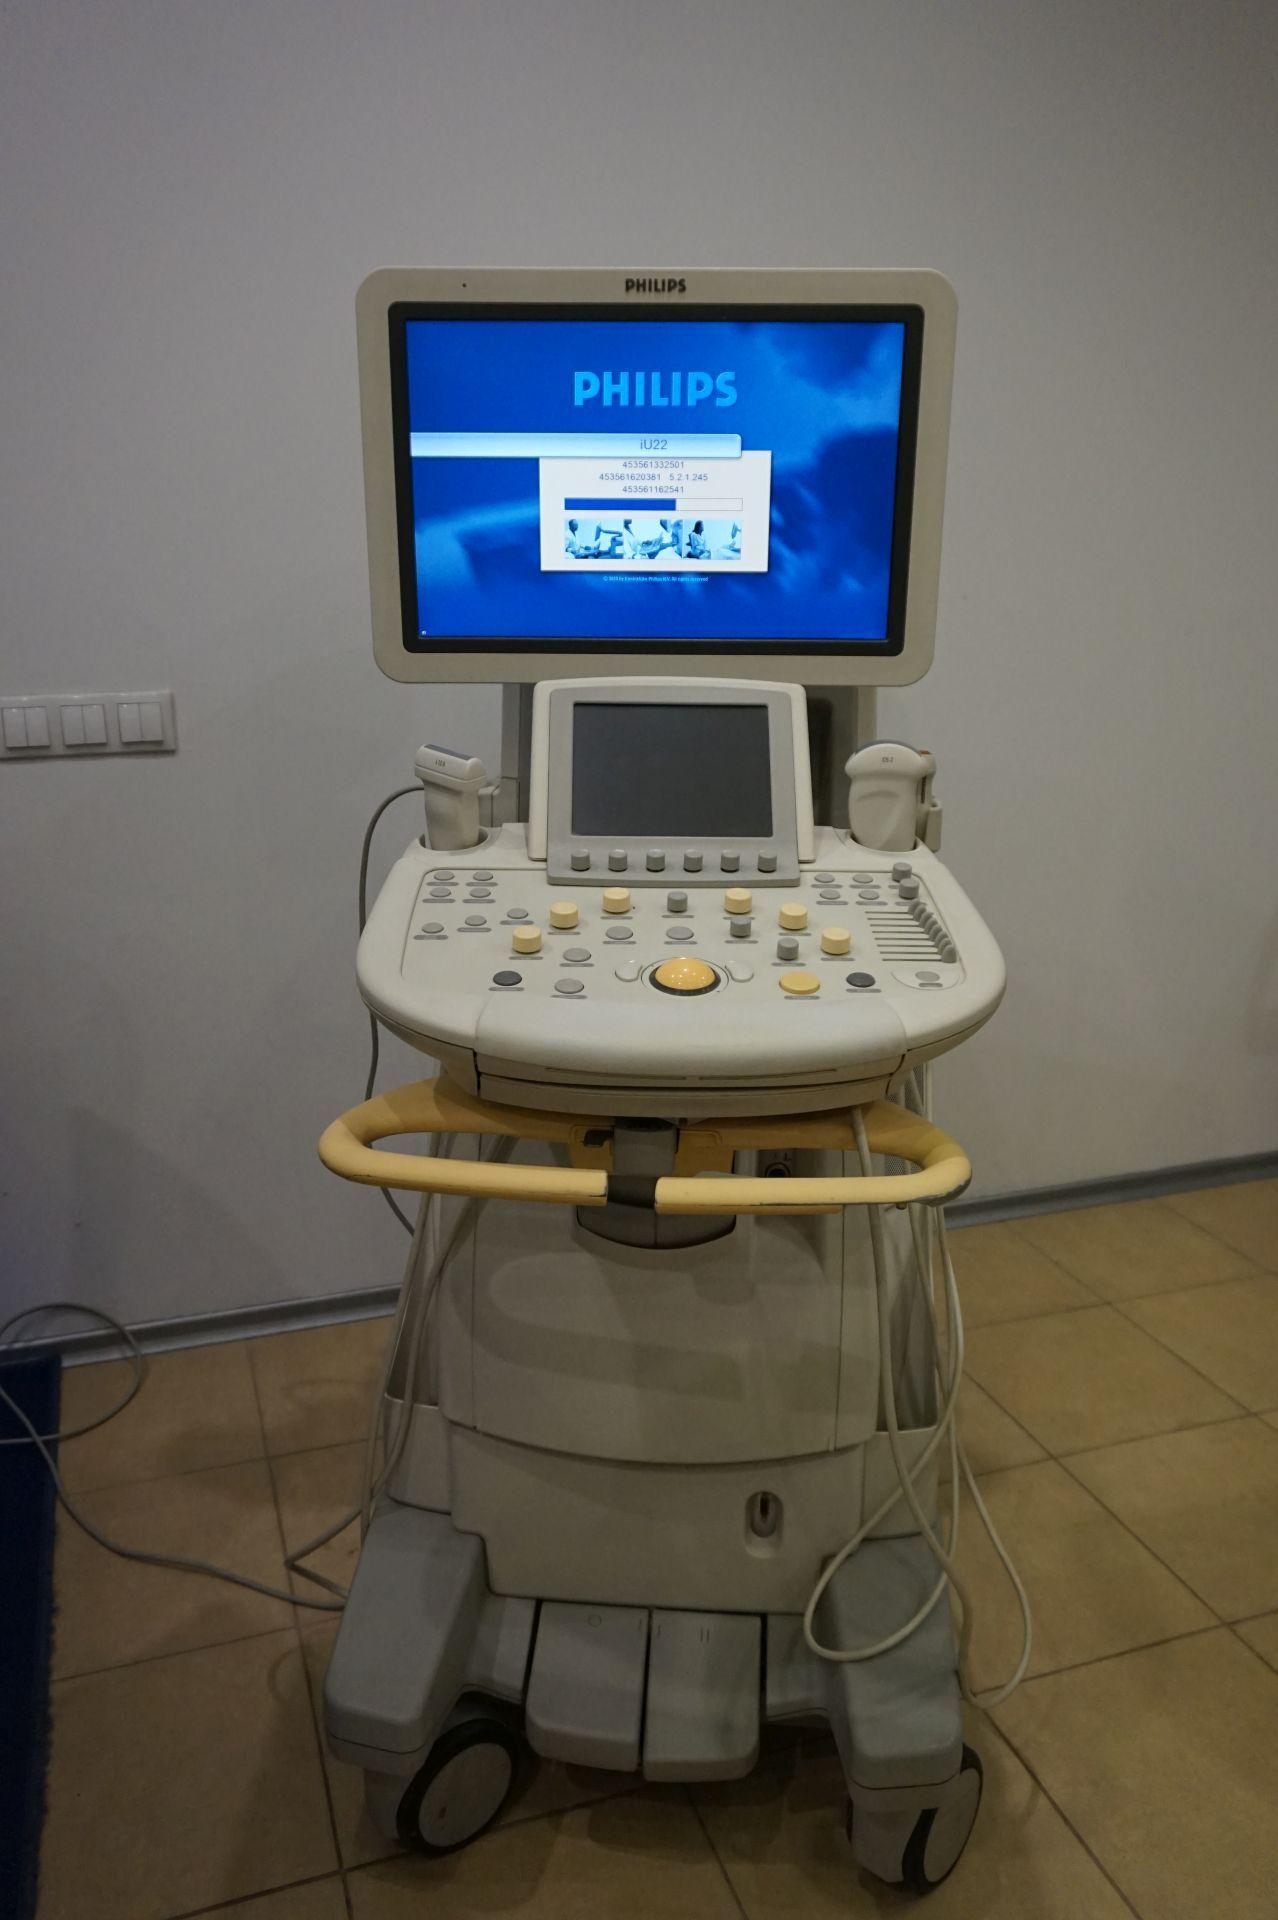 Refurbished Philips Iu22 For Sale Bimedis Id683589 Philips Refurbishing Ultrasound